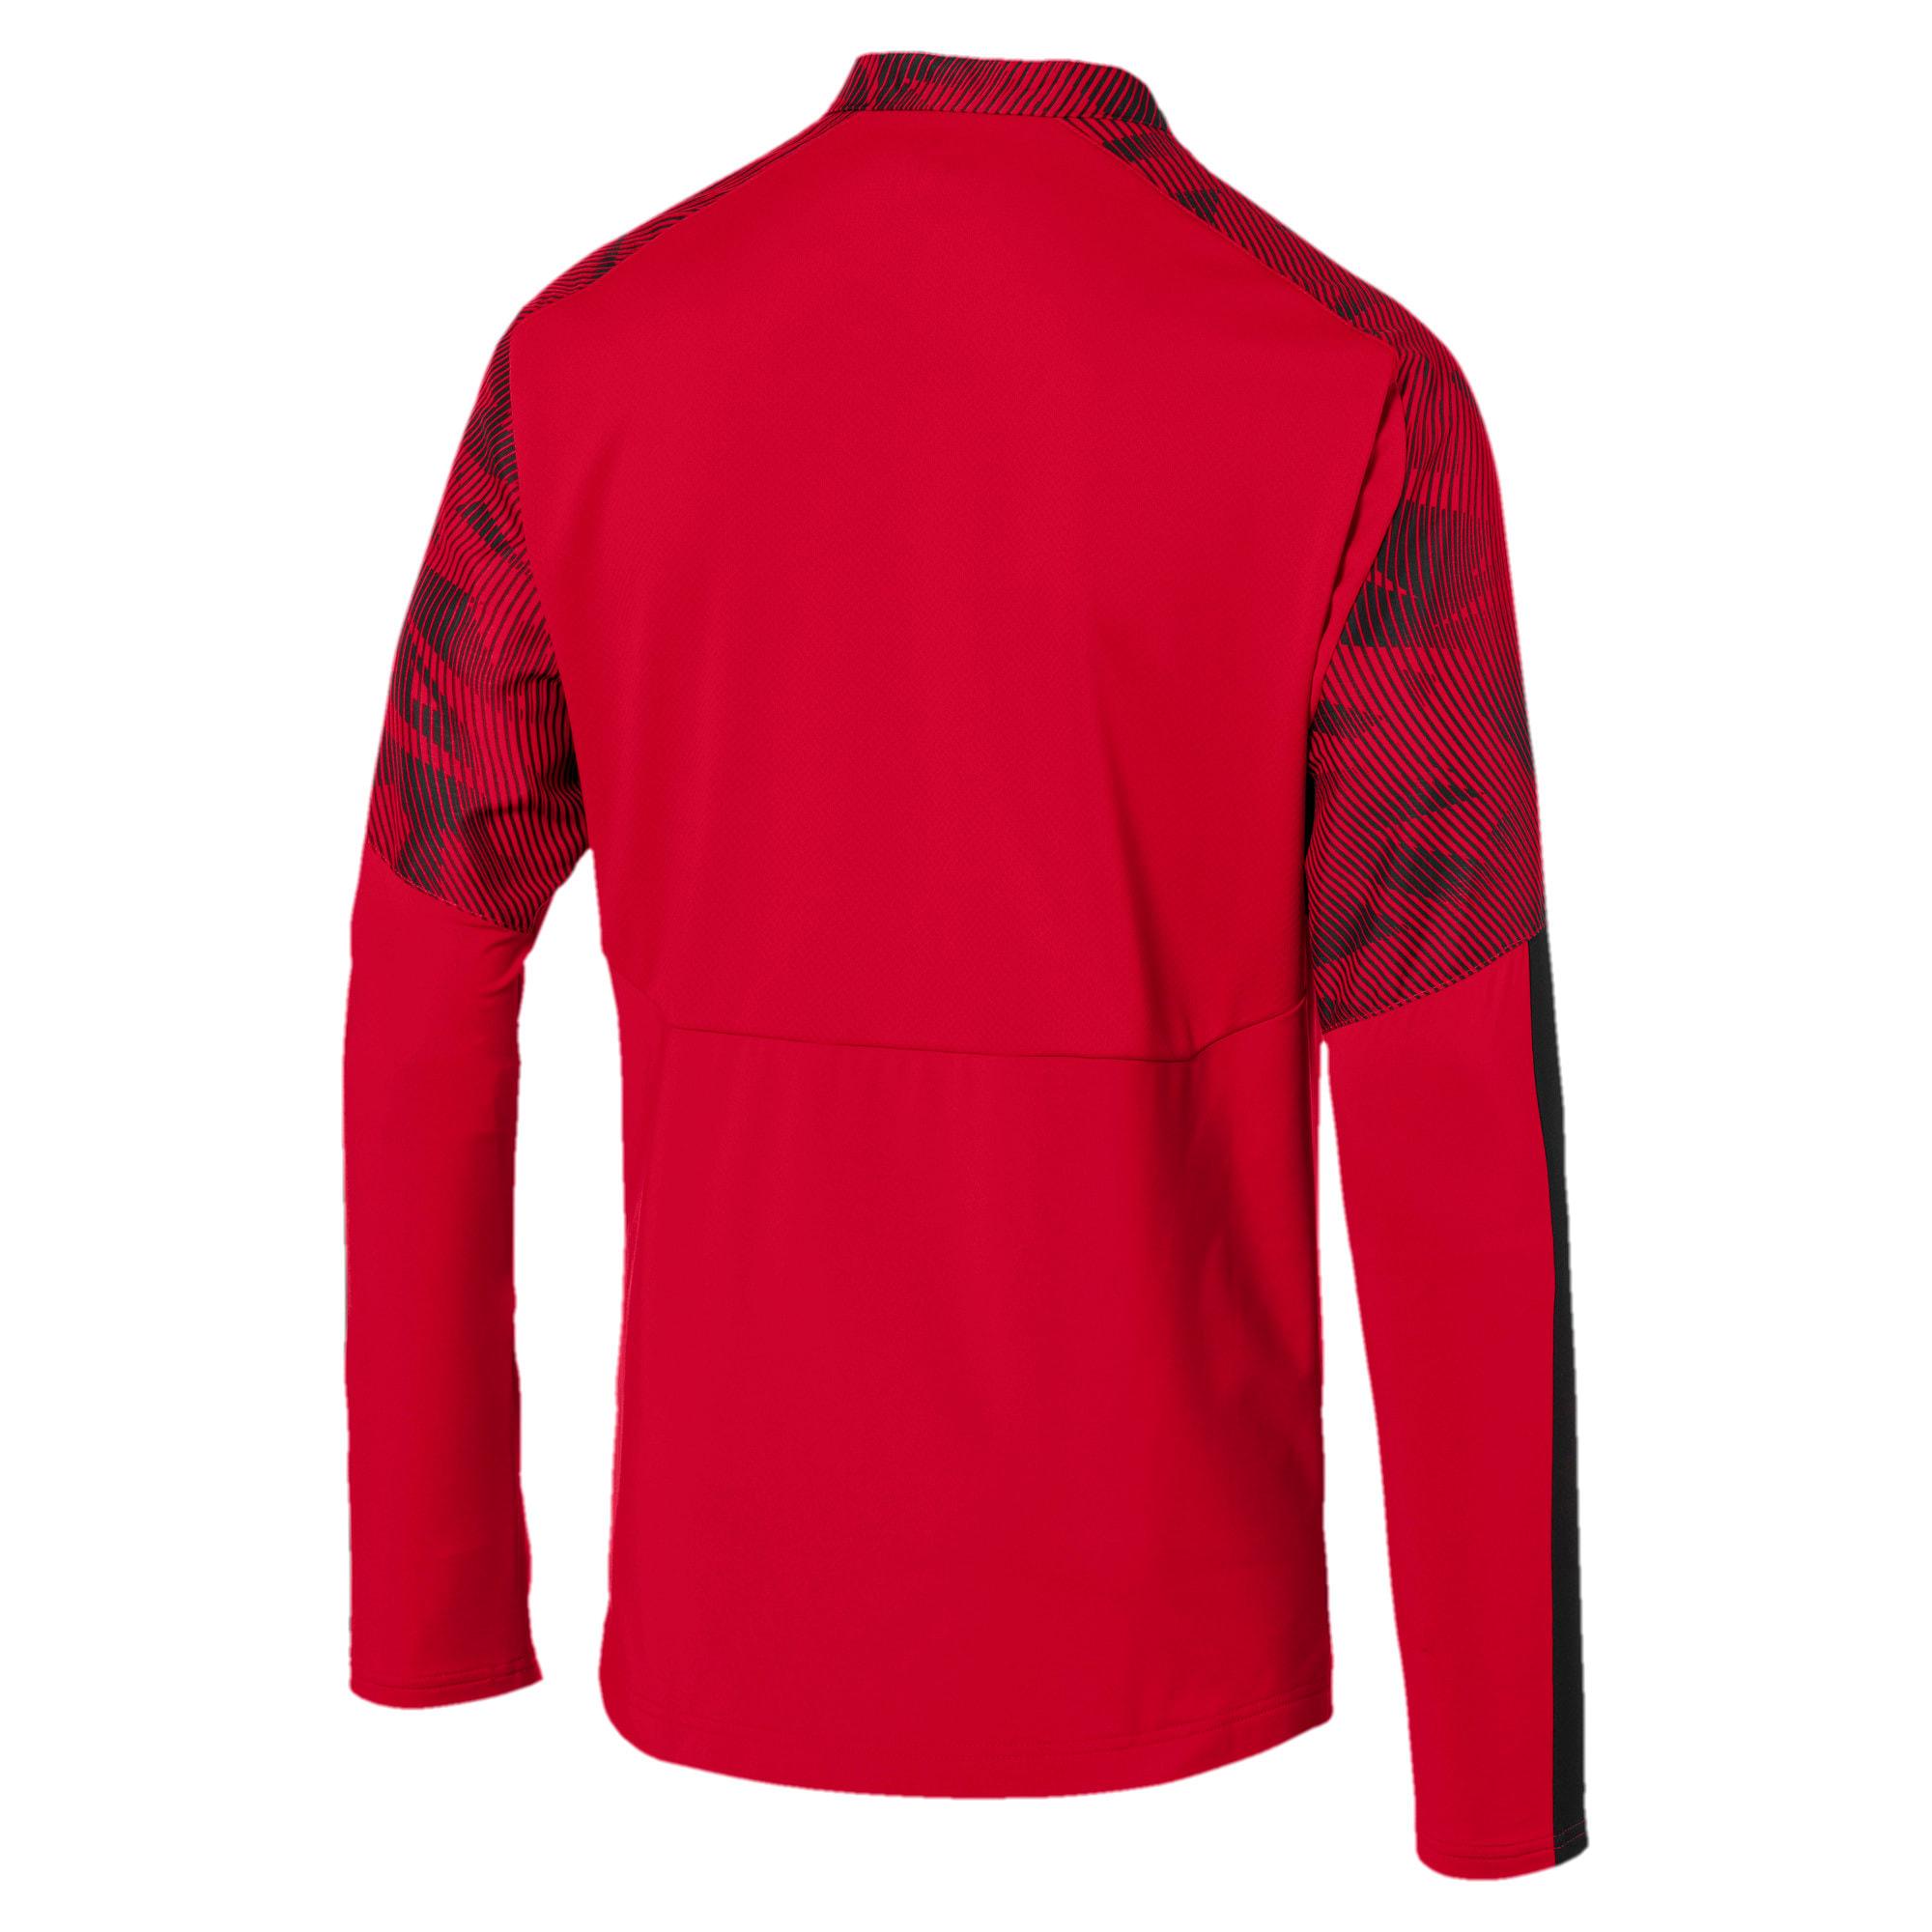 Thumbnail 5 of AC Milan Men's 1/4 Zip Top, Tango Red -Puma Black, medium